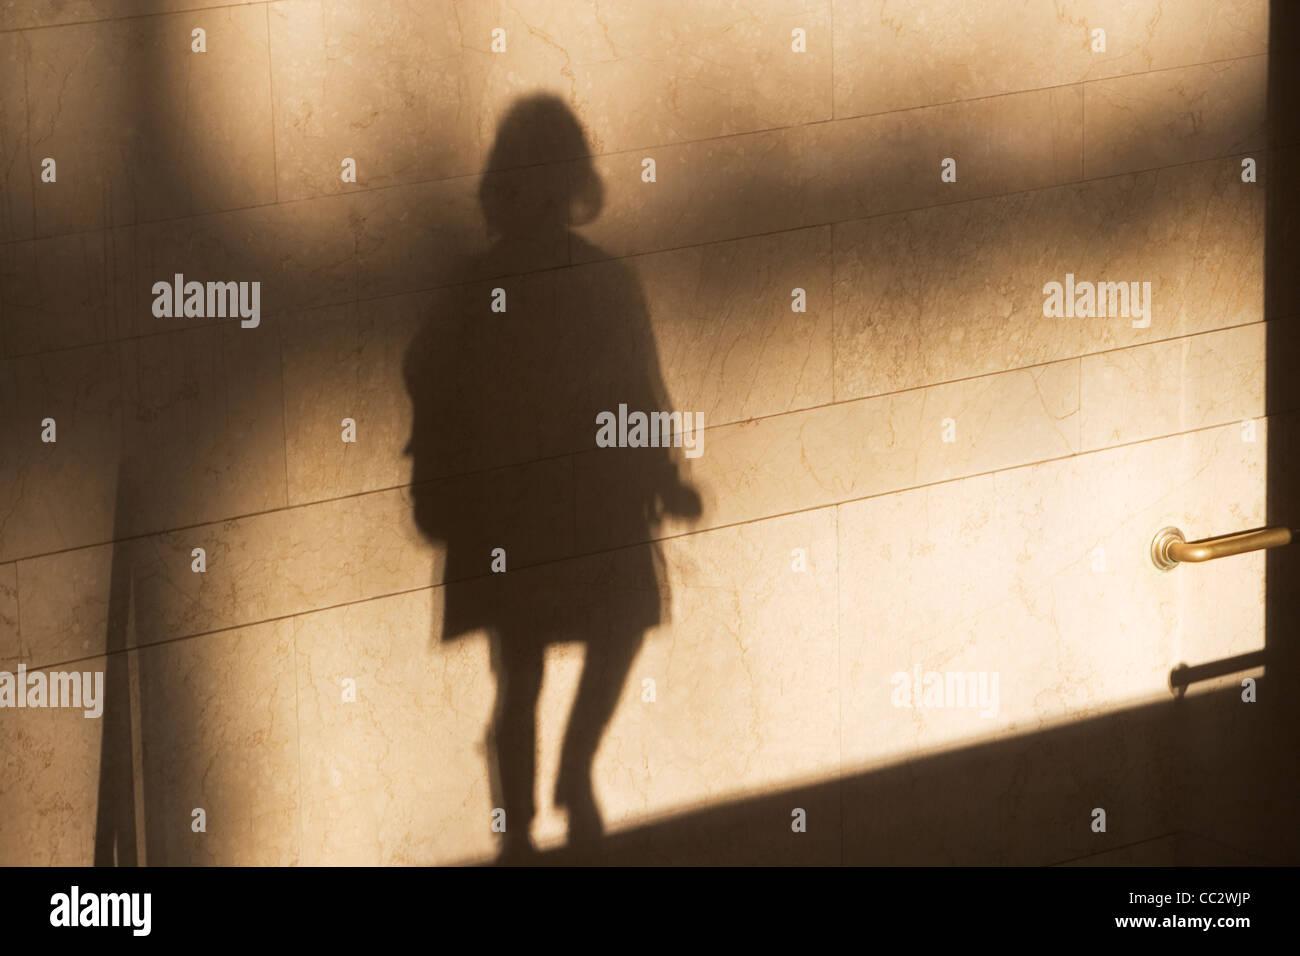 USA, New York City, Shadow of single male pedestrian on sunlit wall Stock Photo